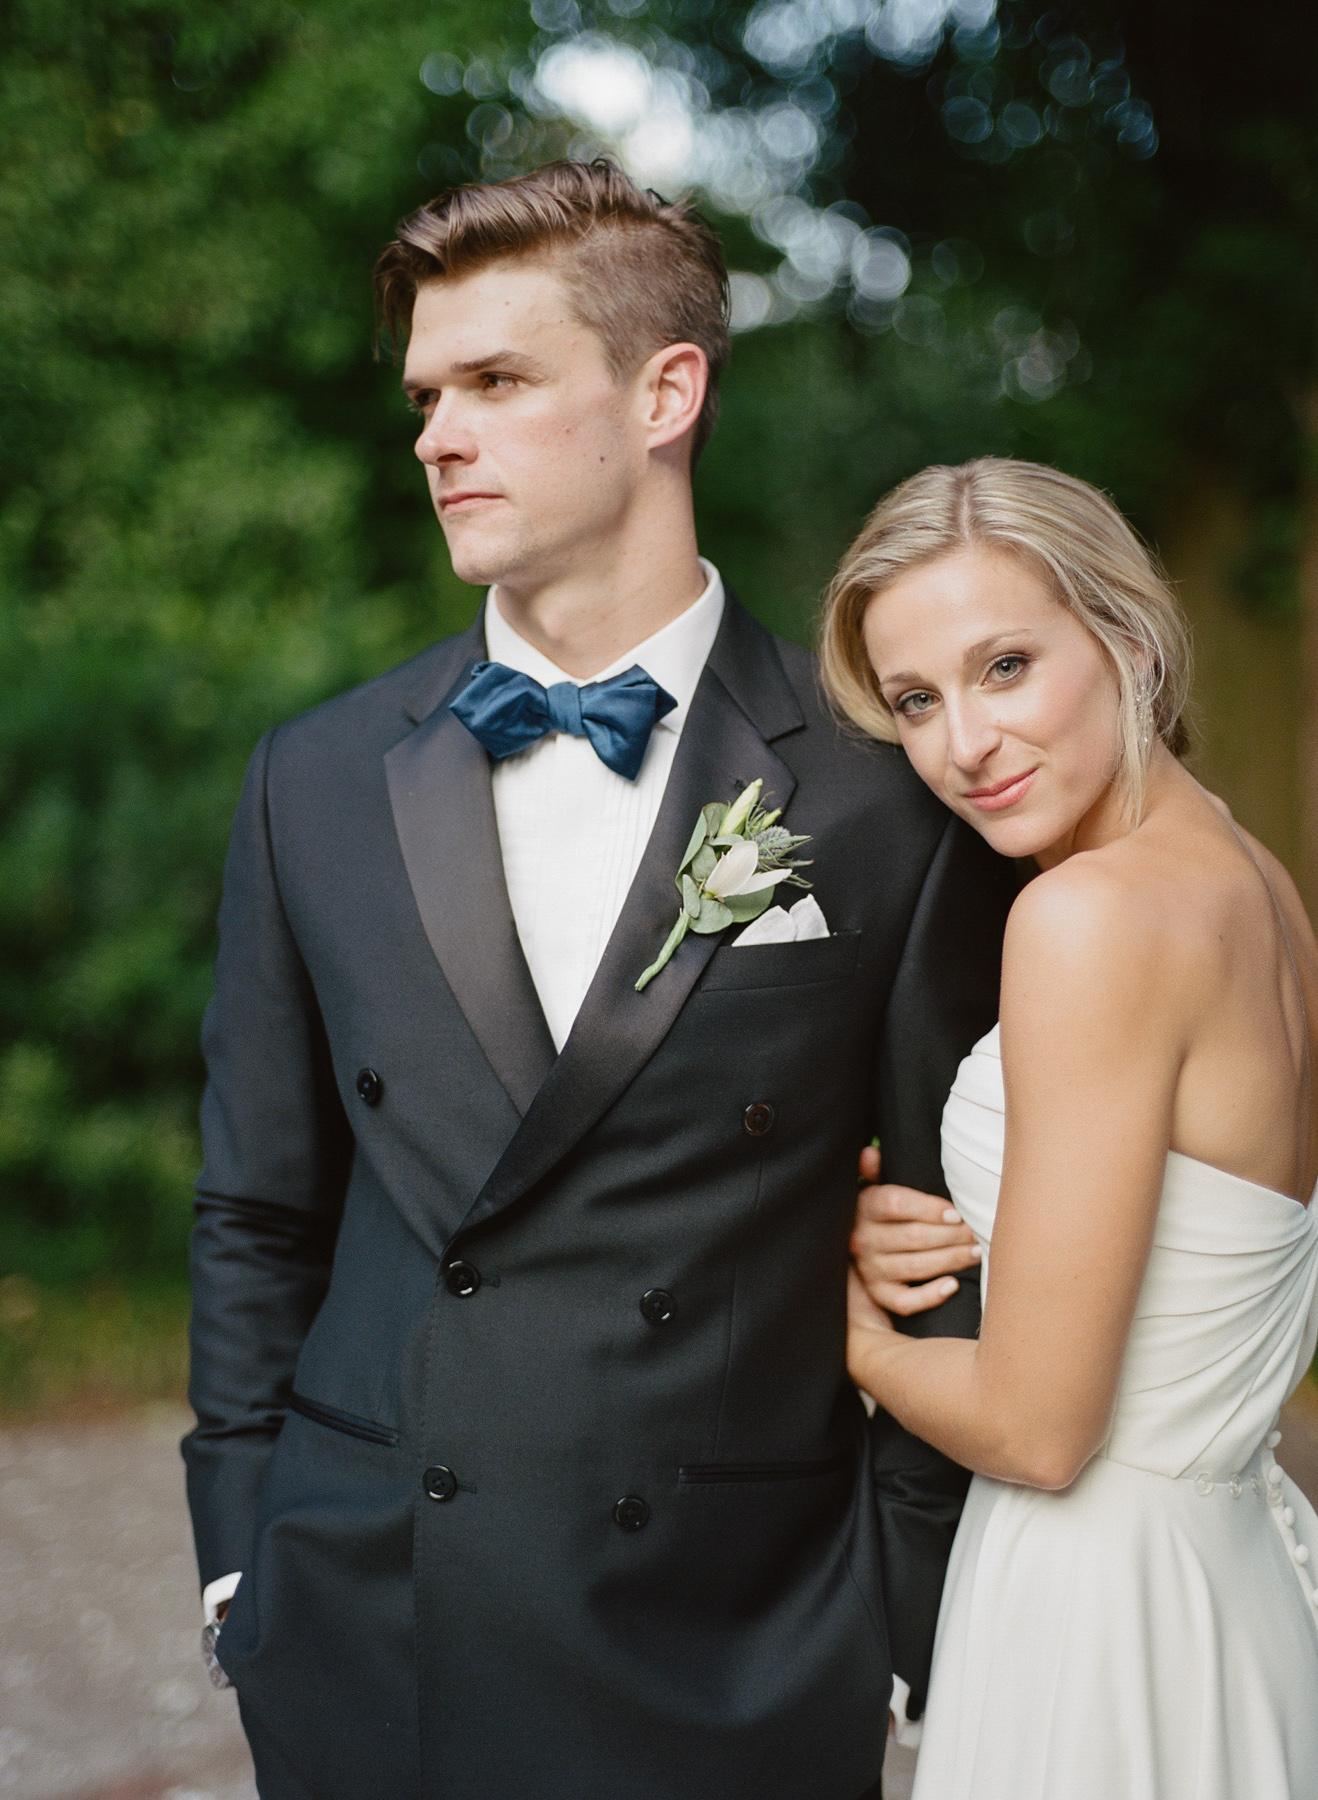 NC-wedding-venues-film-photographer-31.jpg